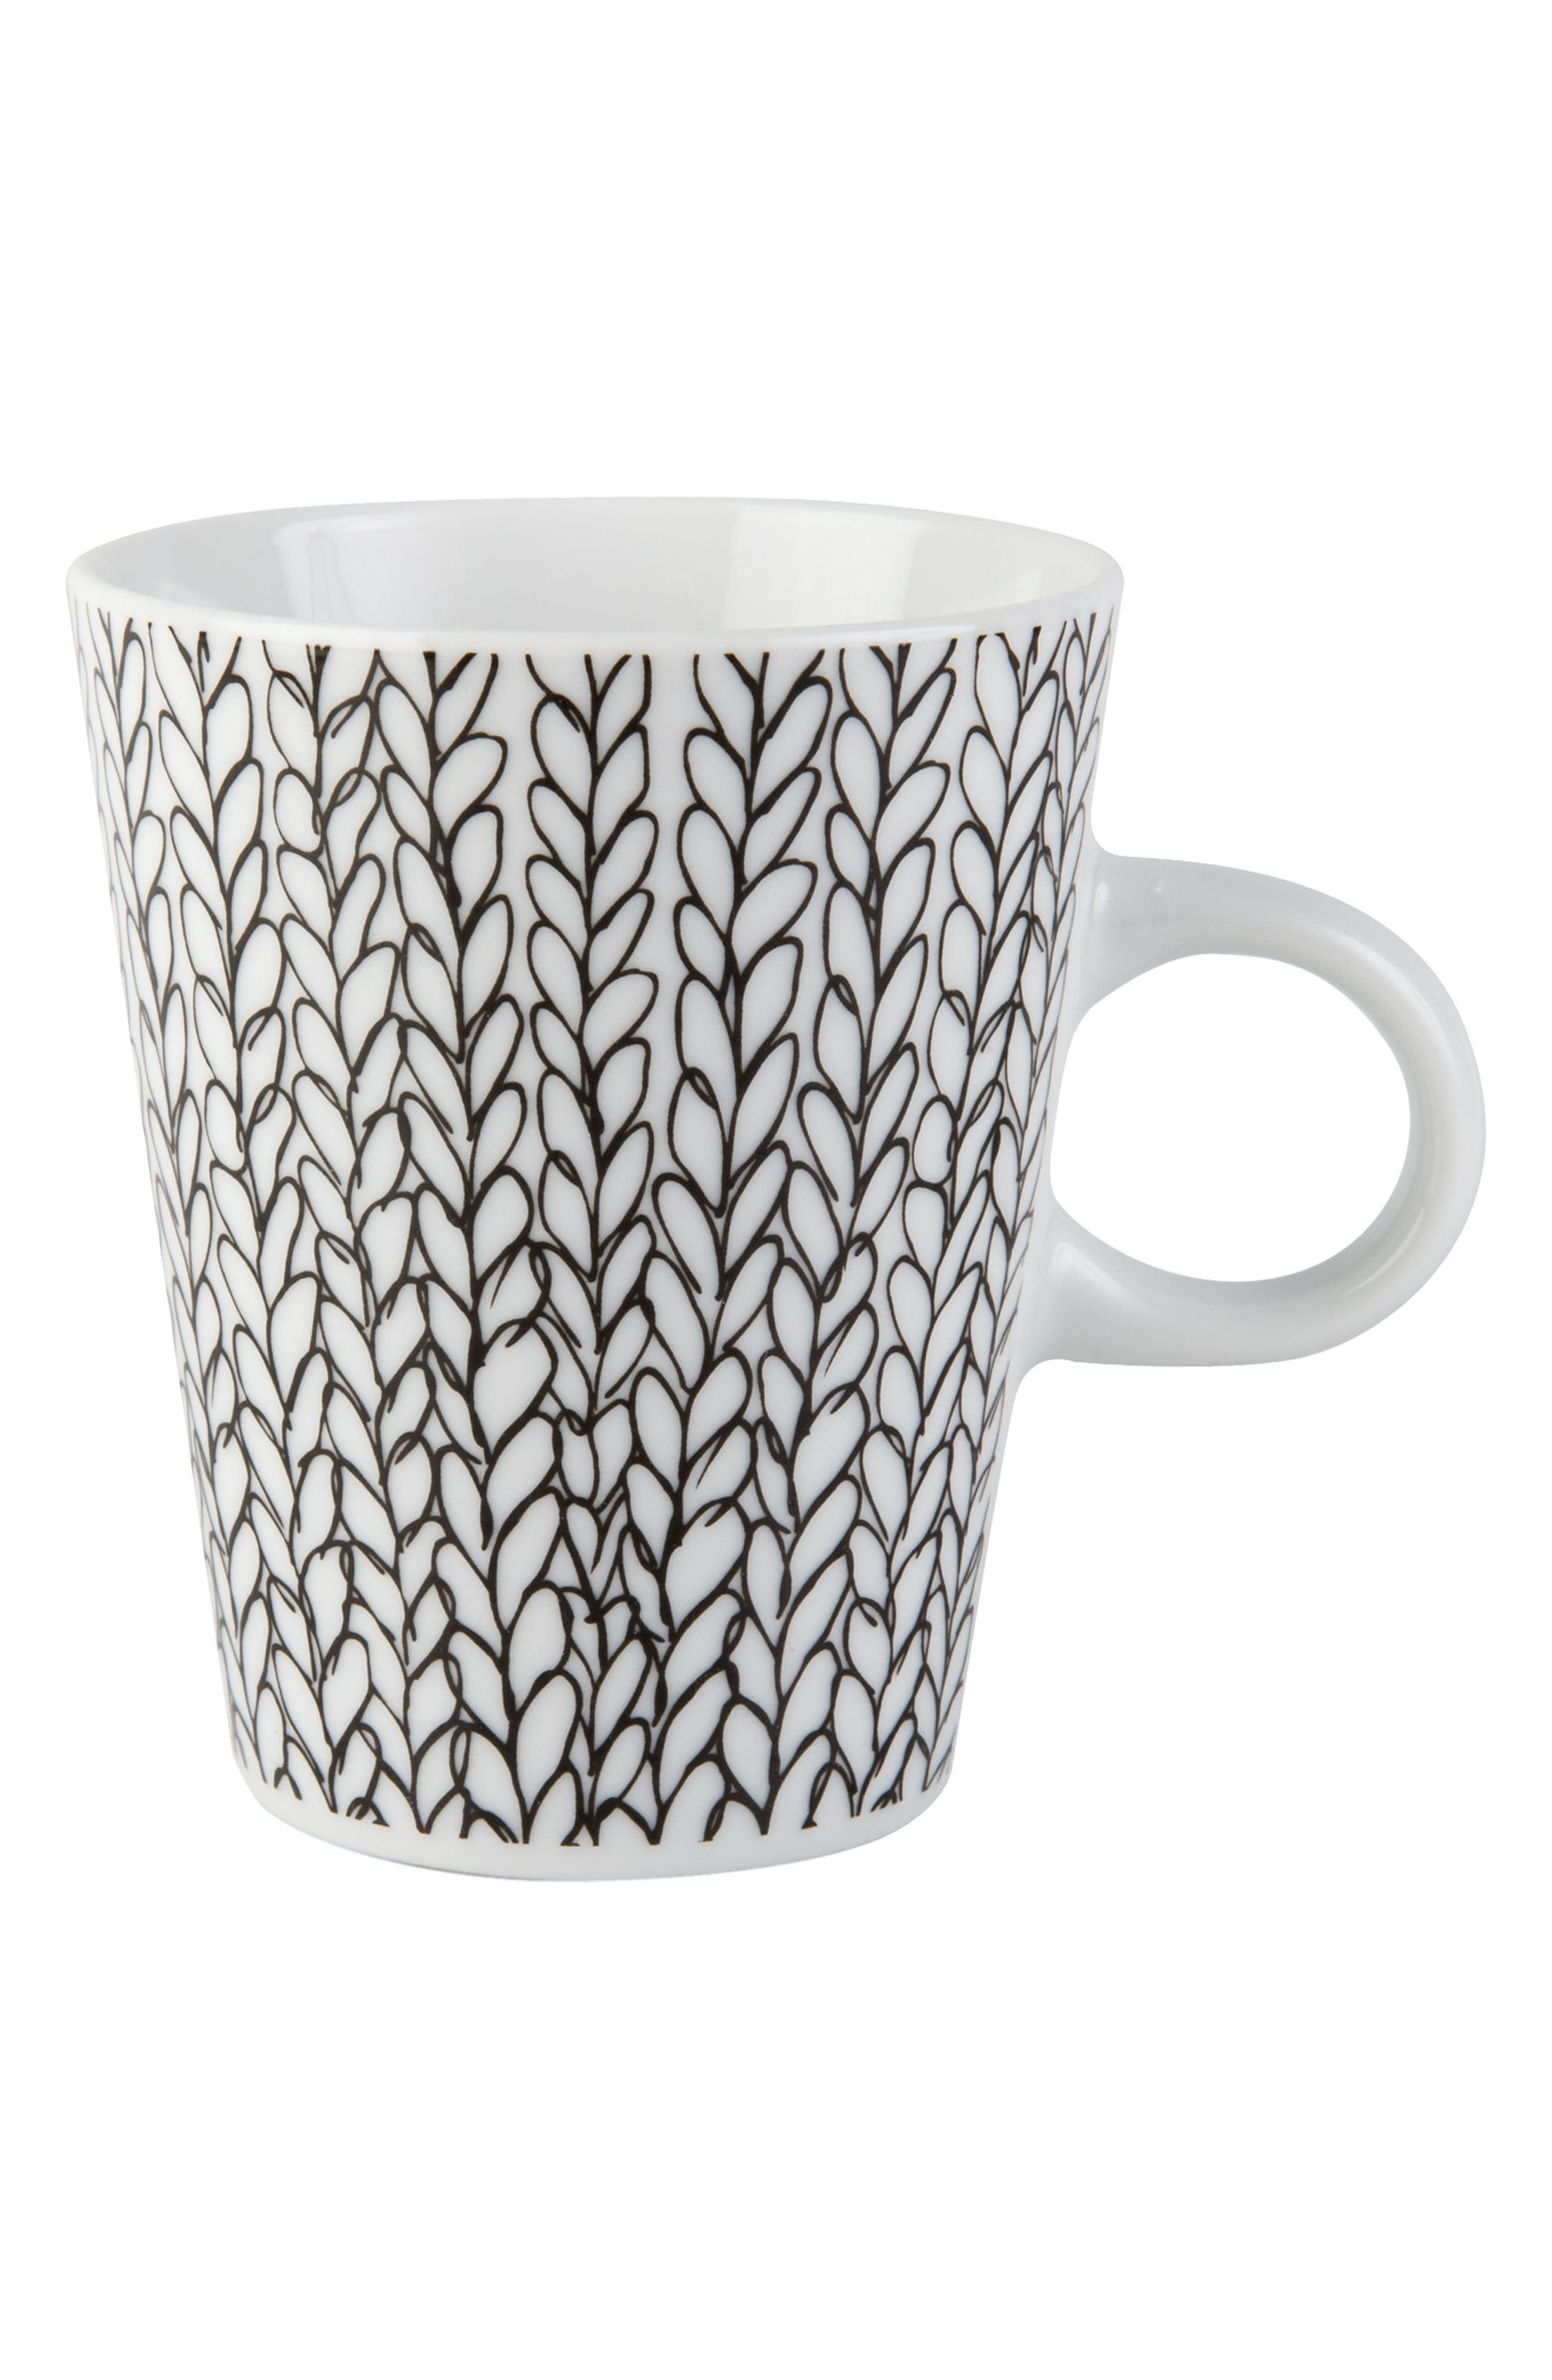 Patterned Porcelain Mug,                             Main thumbnail 1, color,